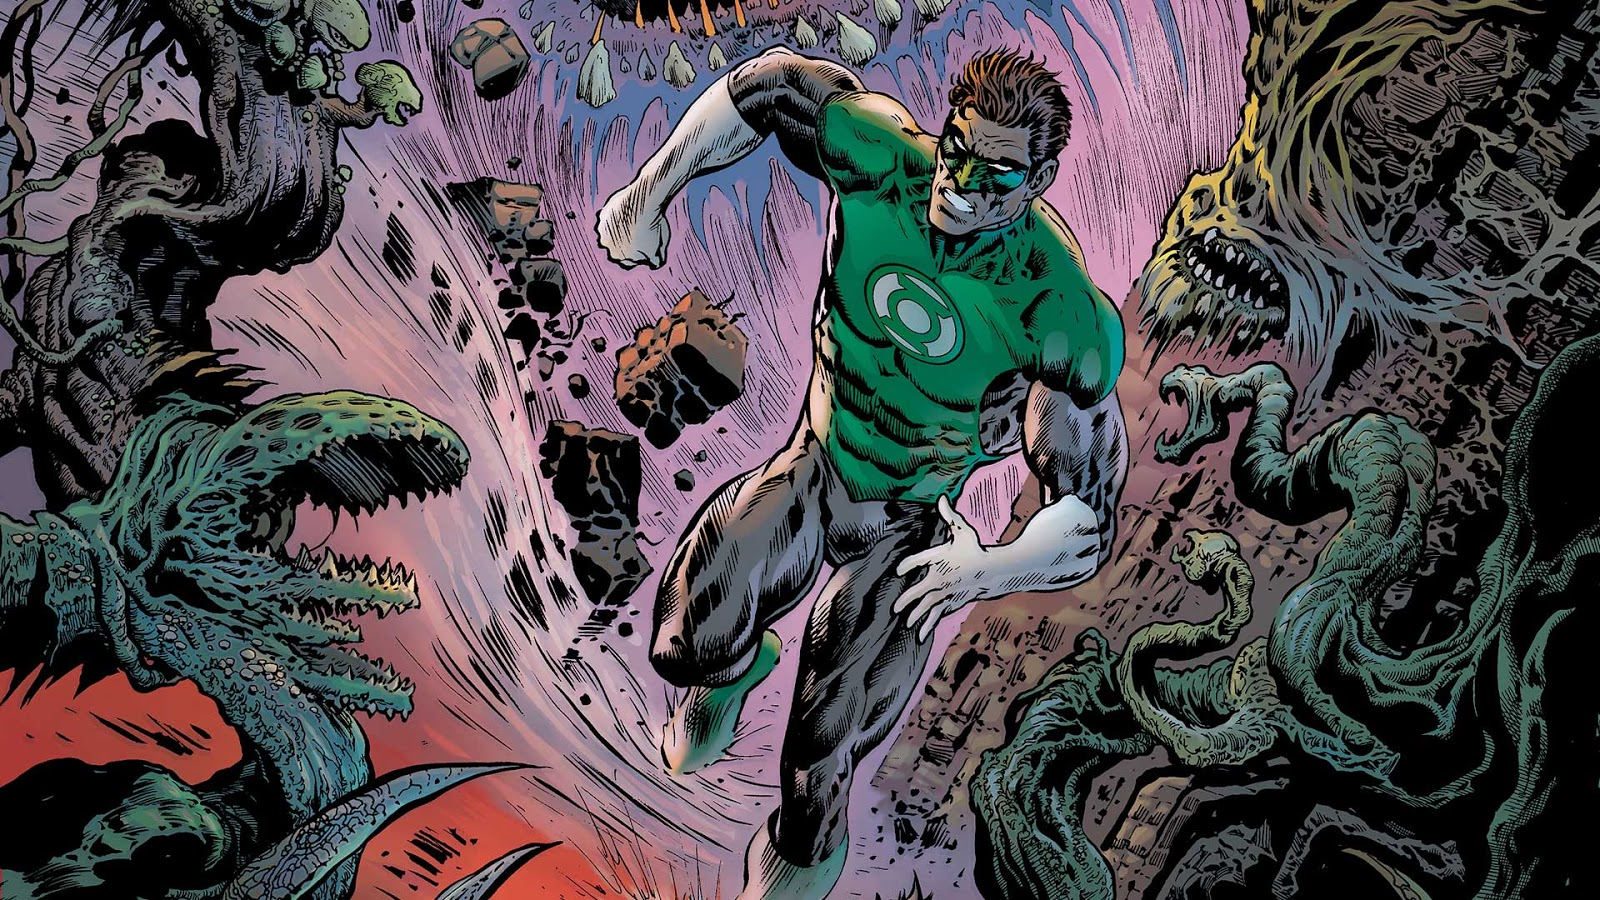 The Green Lantern #5